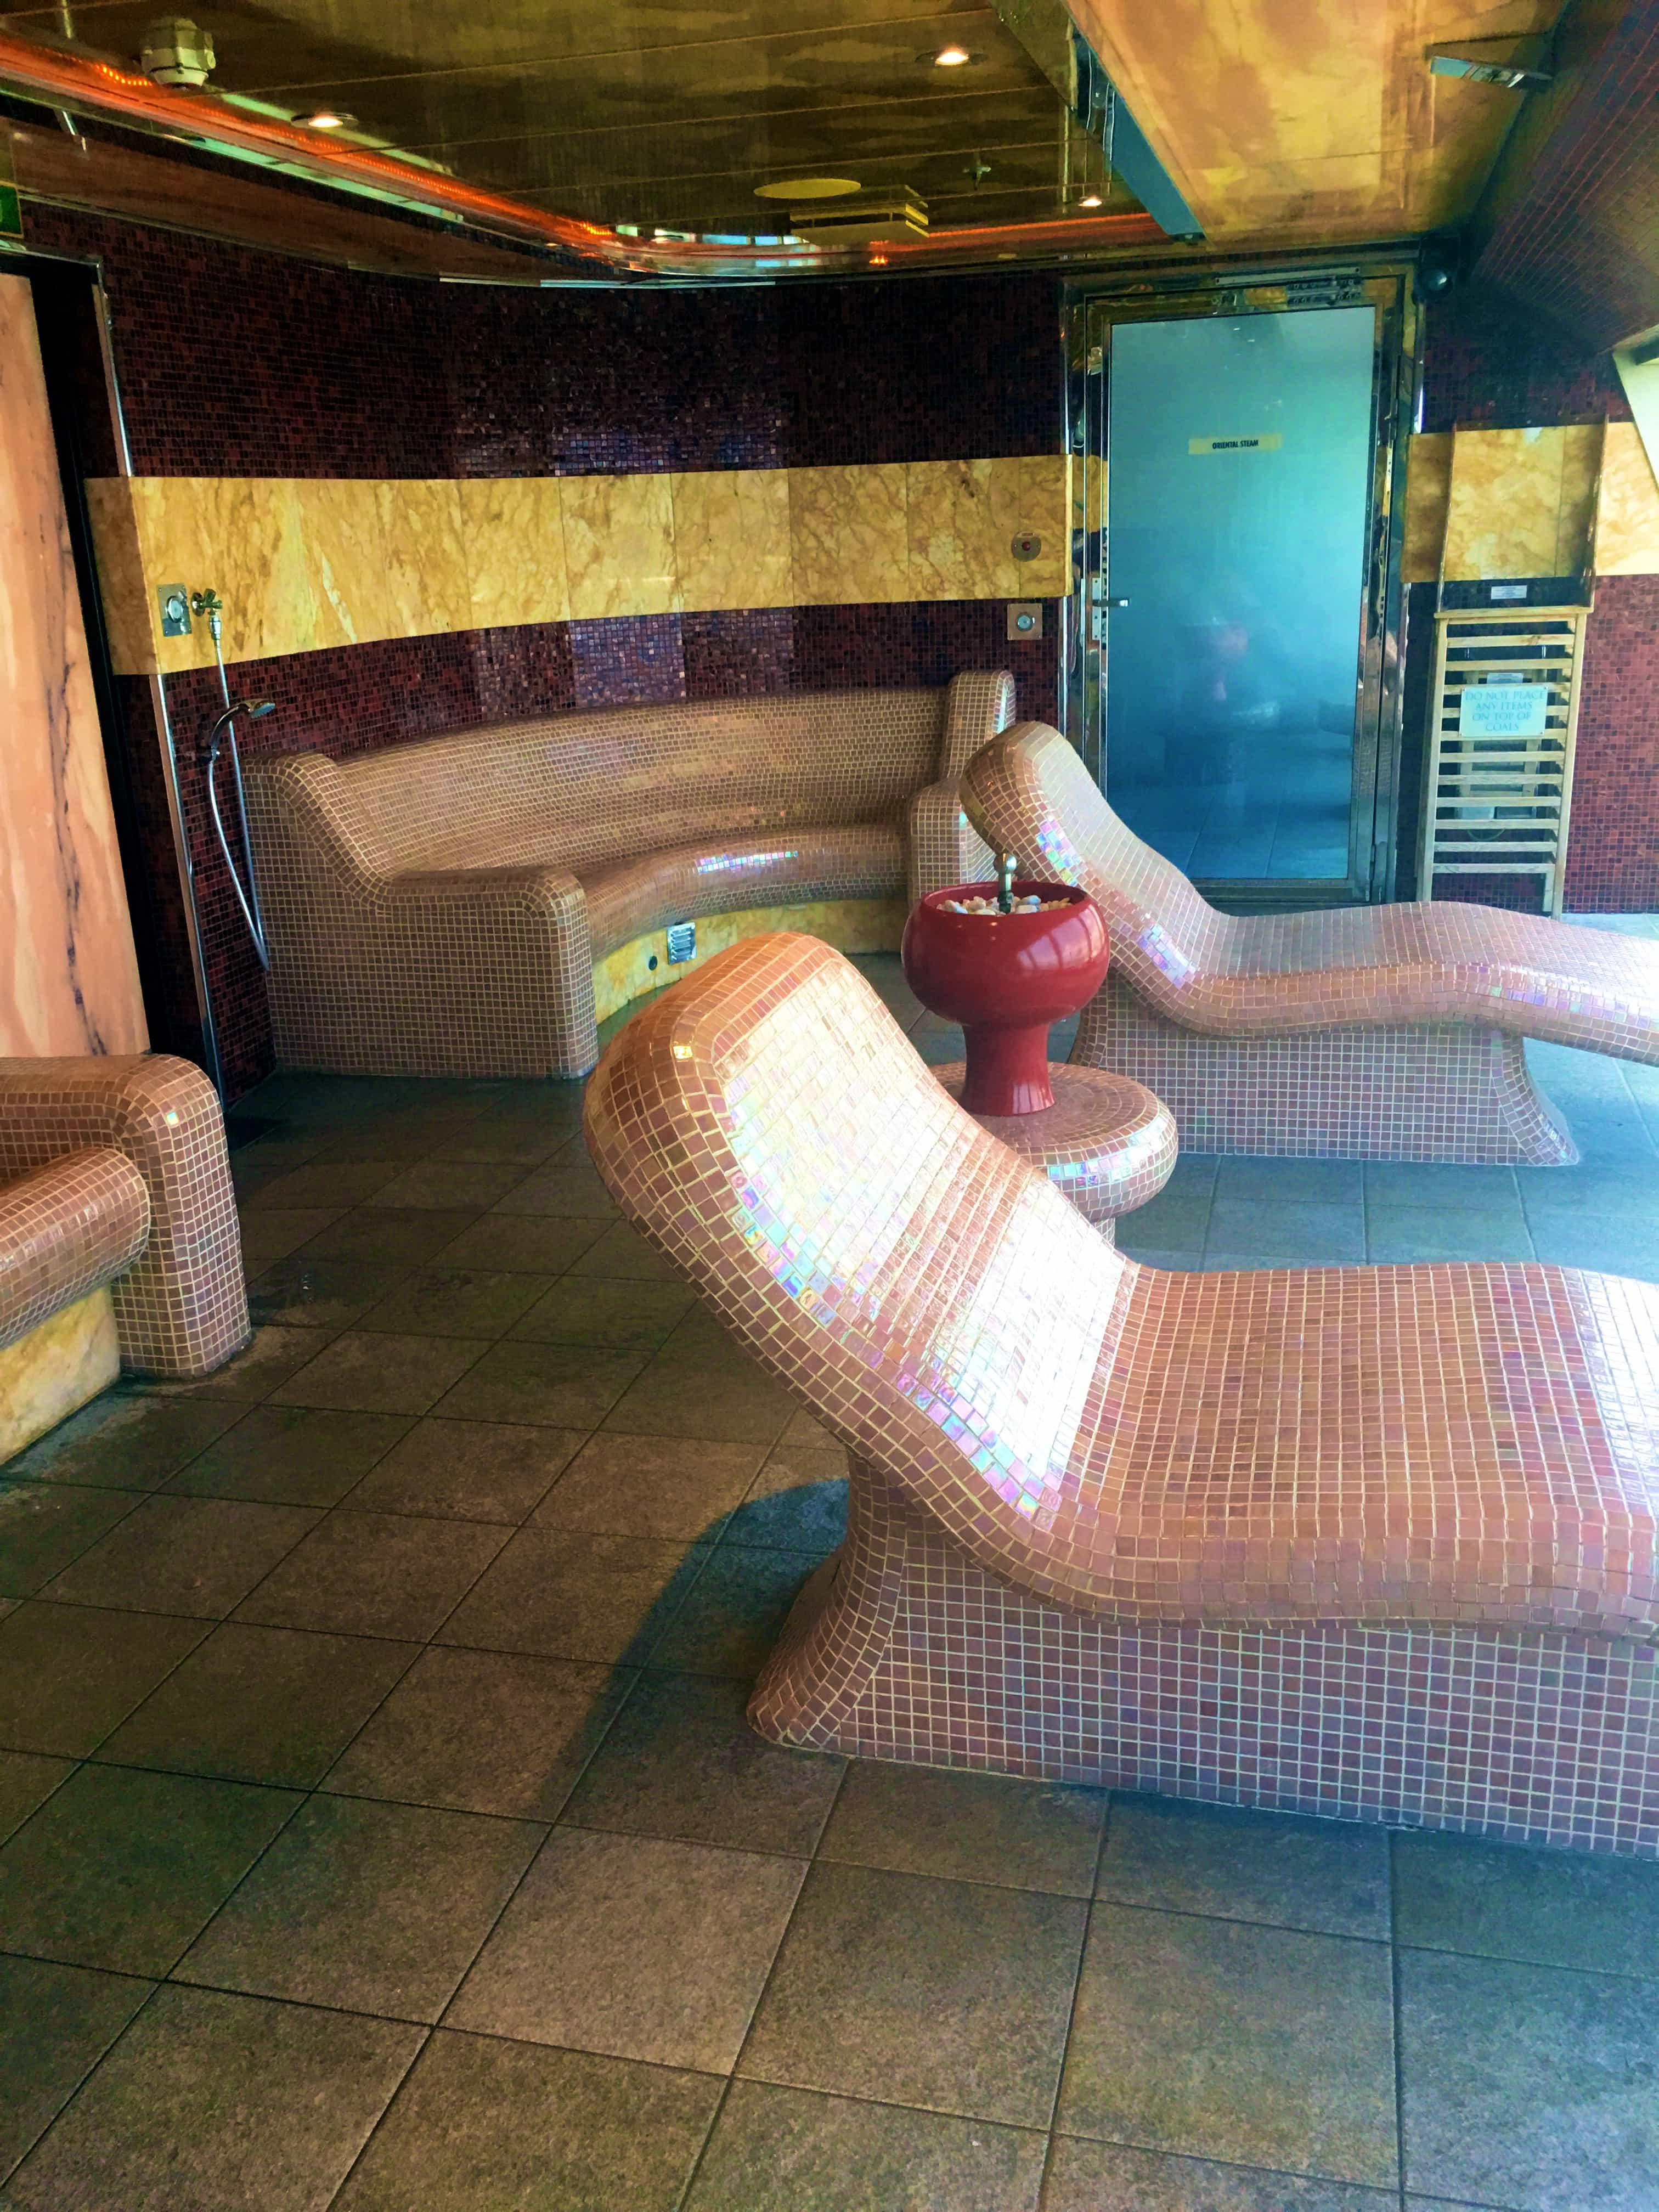 9 Reasons Cruising the Carnival Magic Good for Adults - Carnival Magic Cloud 9 Thermal Room